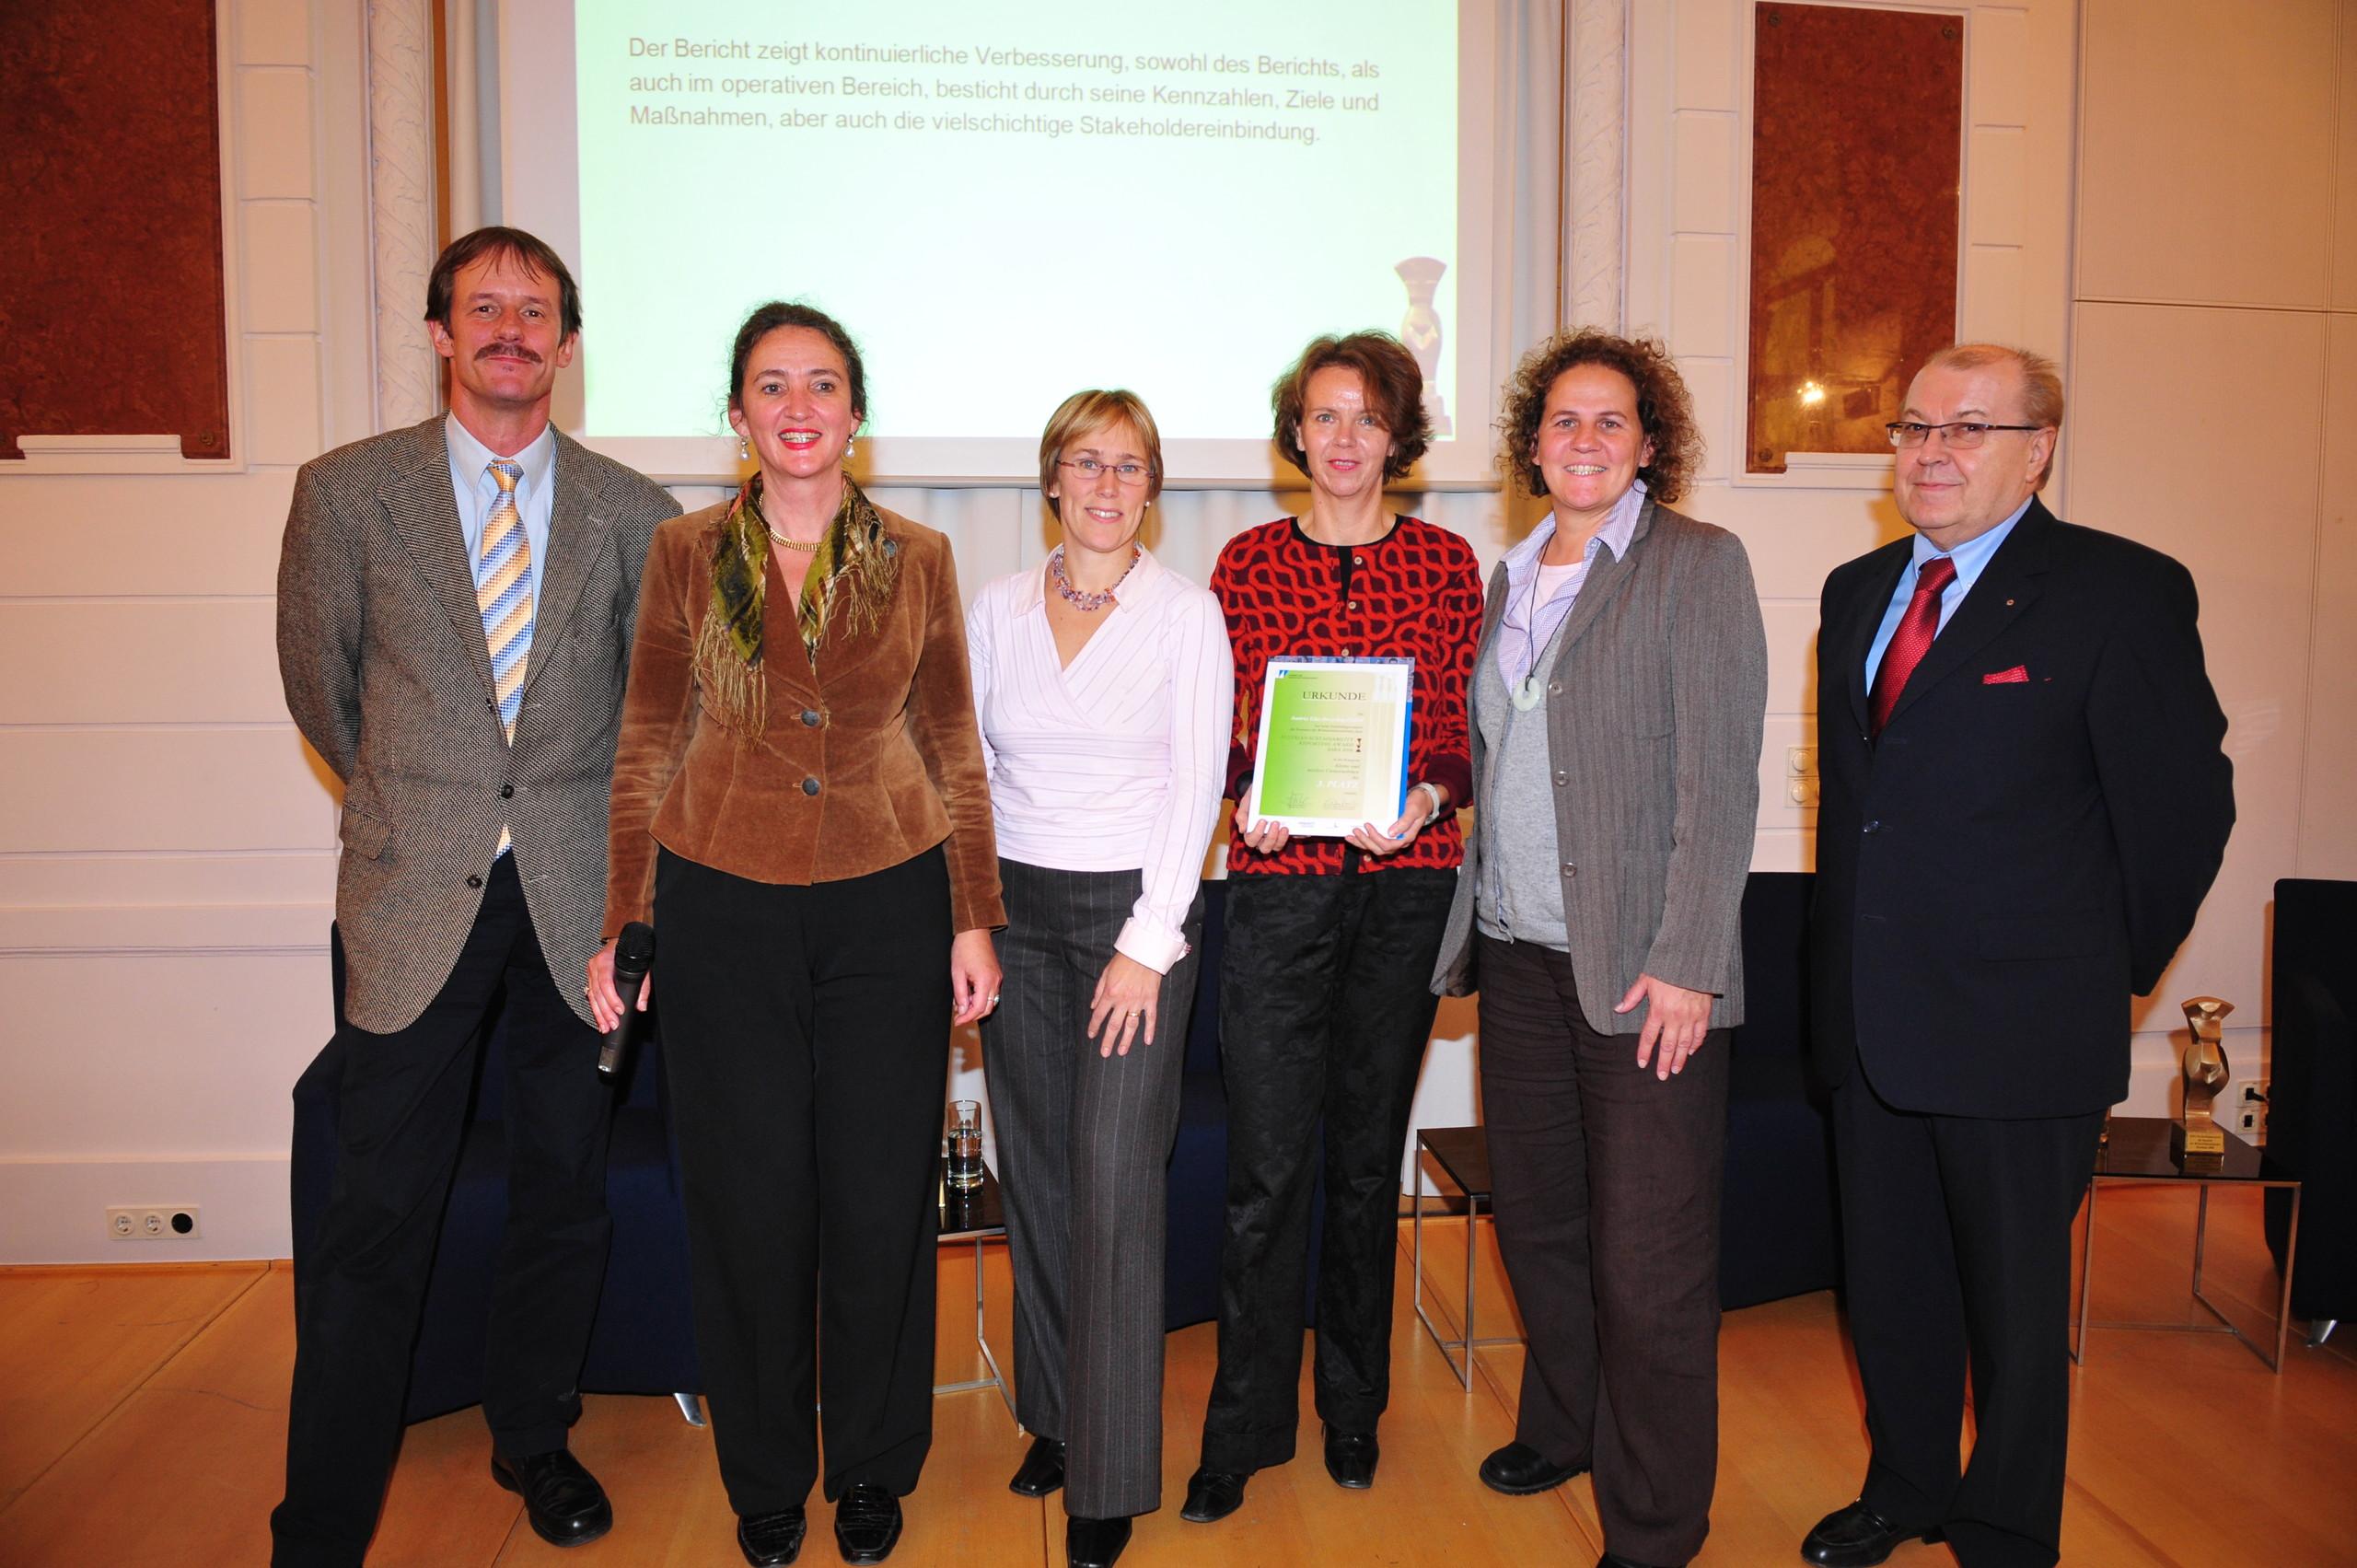 EMAS-Preis 2005 für Austria Glas Recycling, (v.l.n.r.: Dr. Gerald Hirss-Werdisheim, Monika Piber-Maslo, DI Ursula Gangel, BM Pröll)